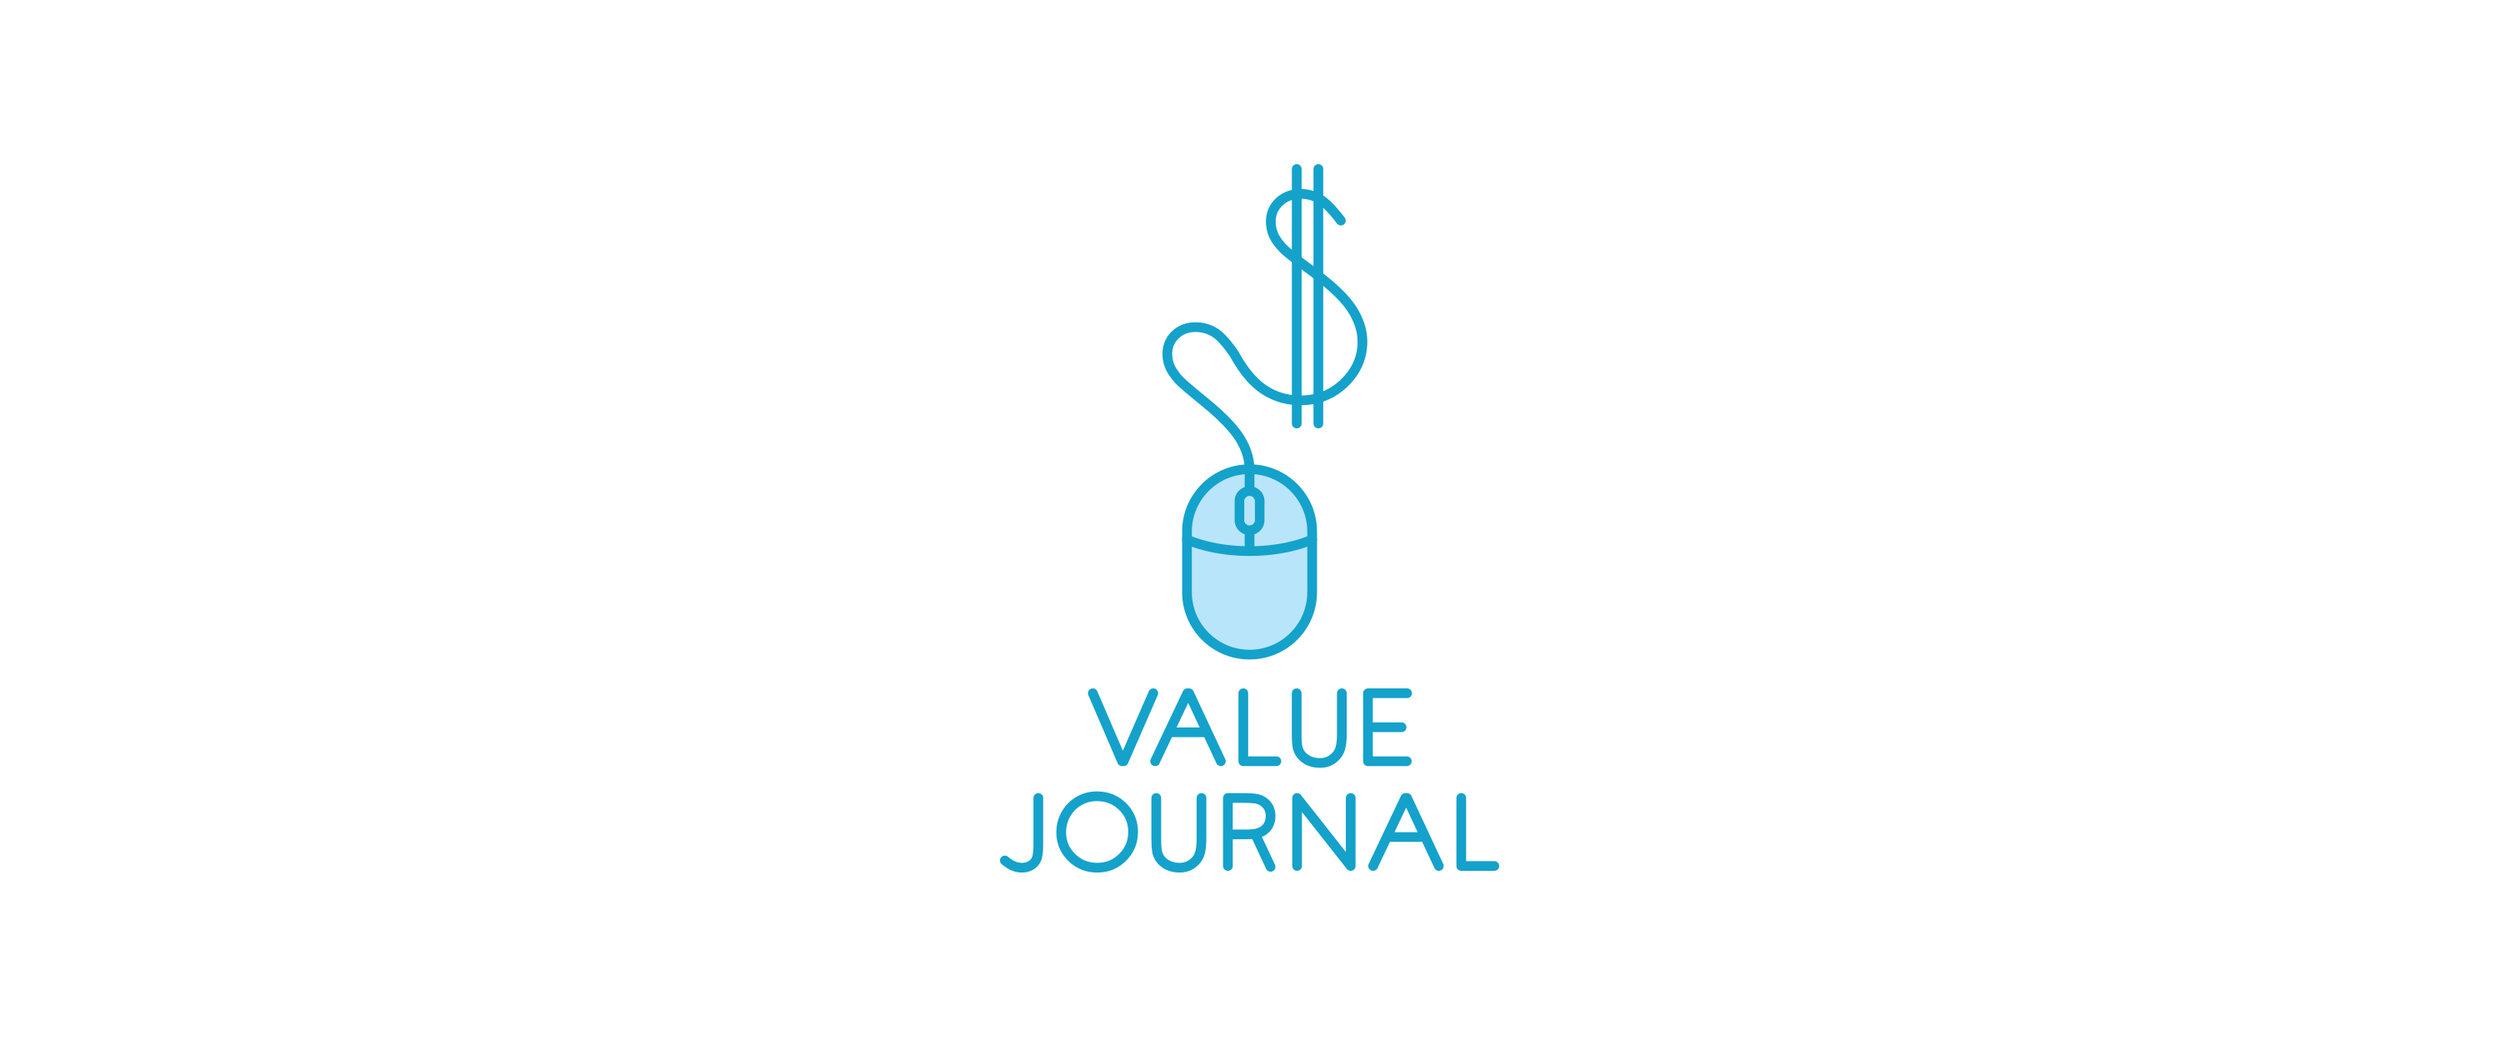 A digital finance blog